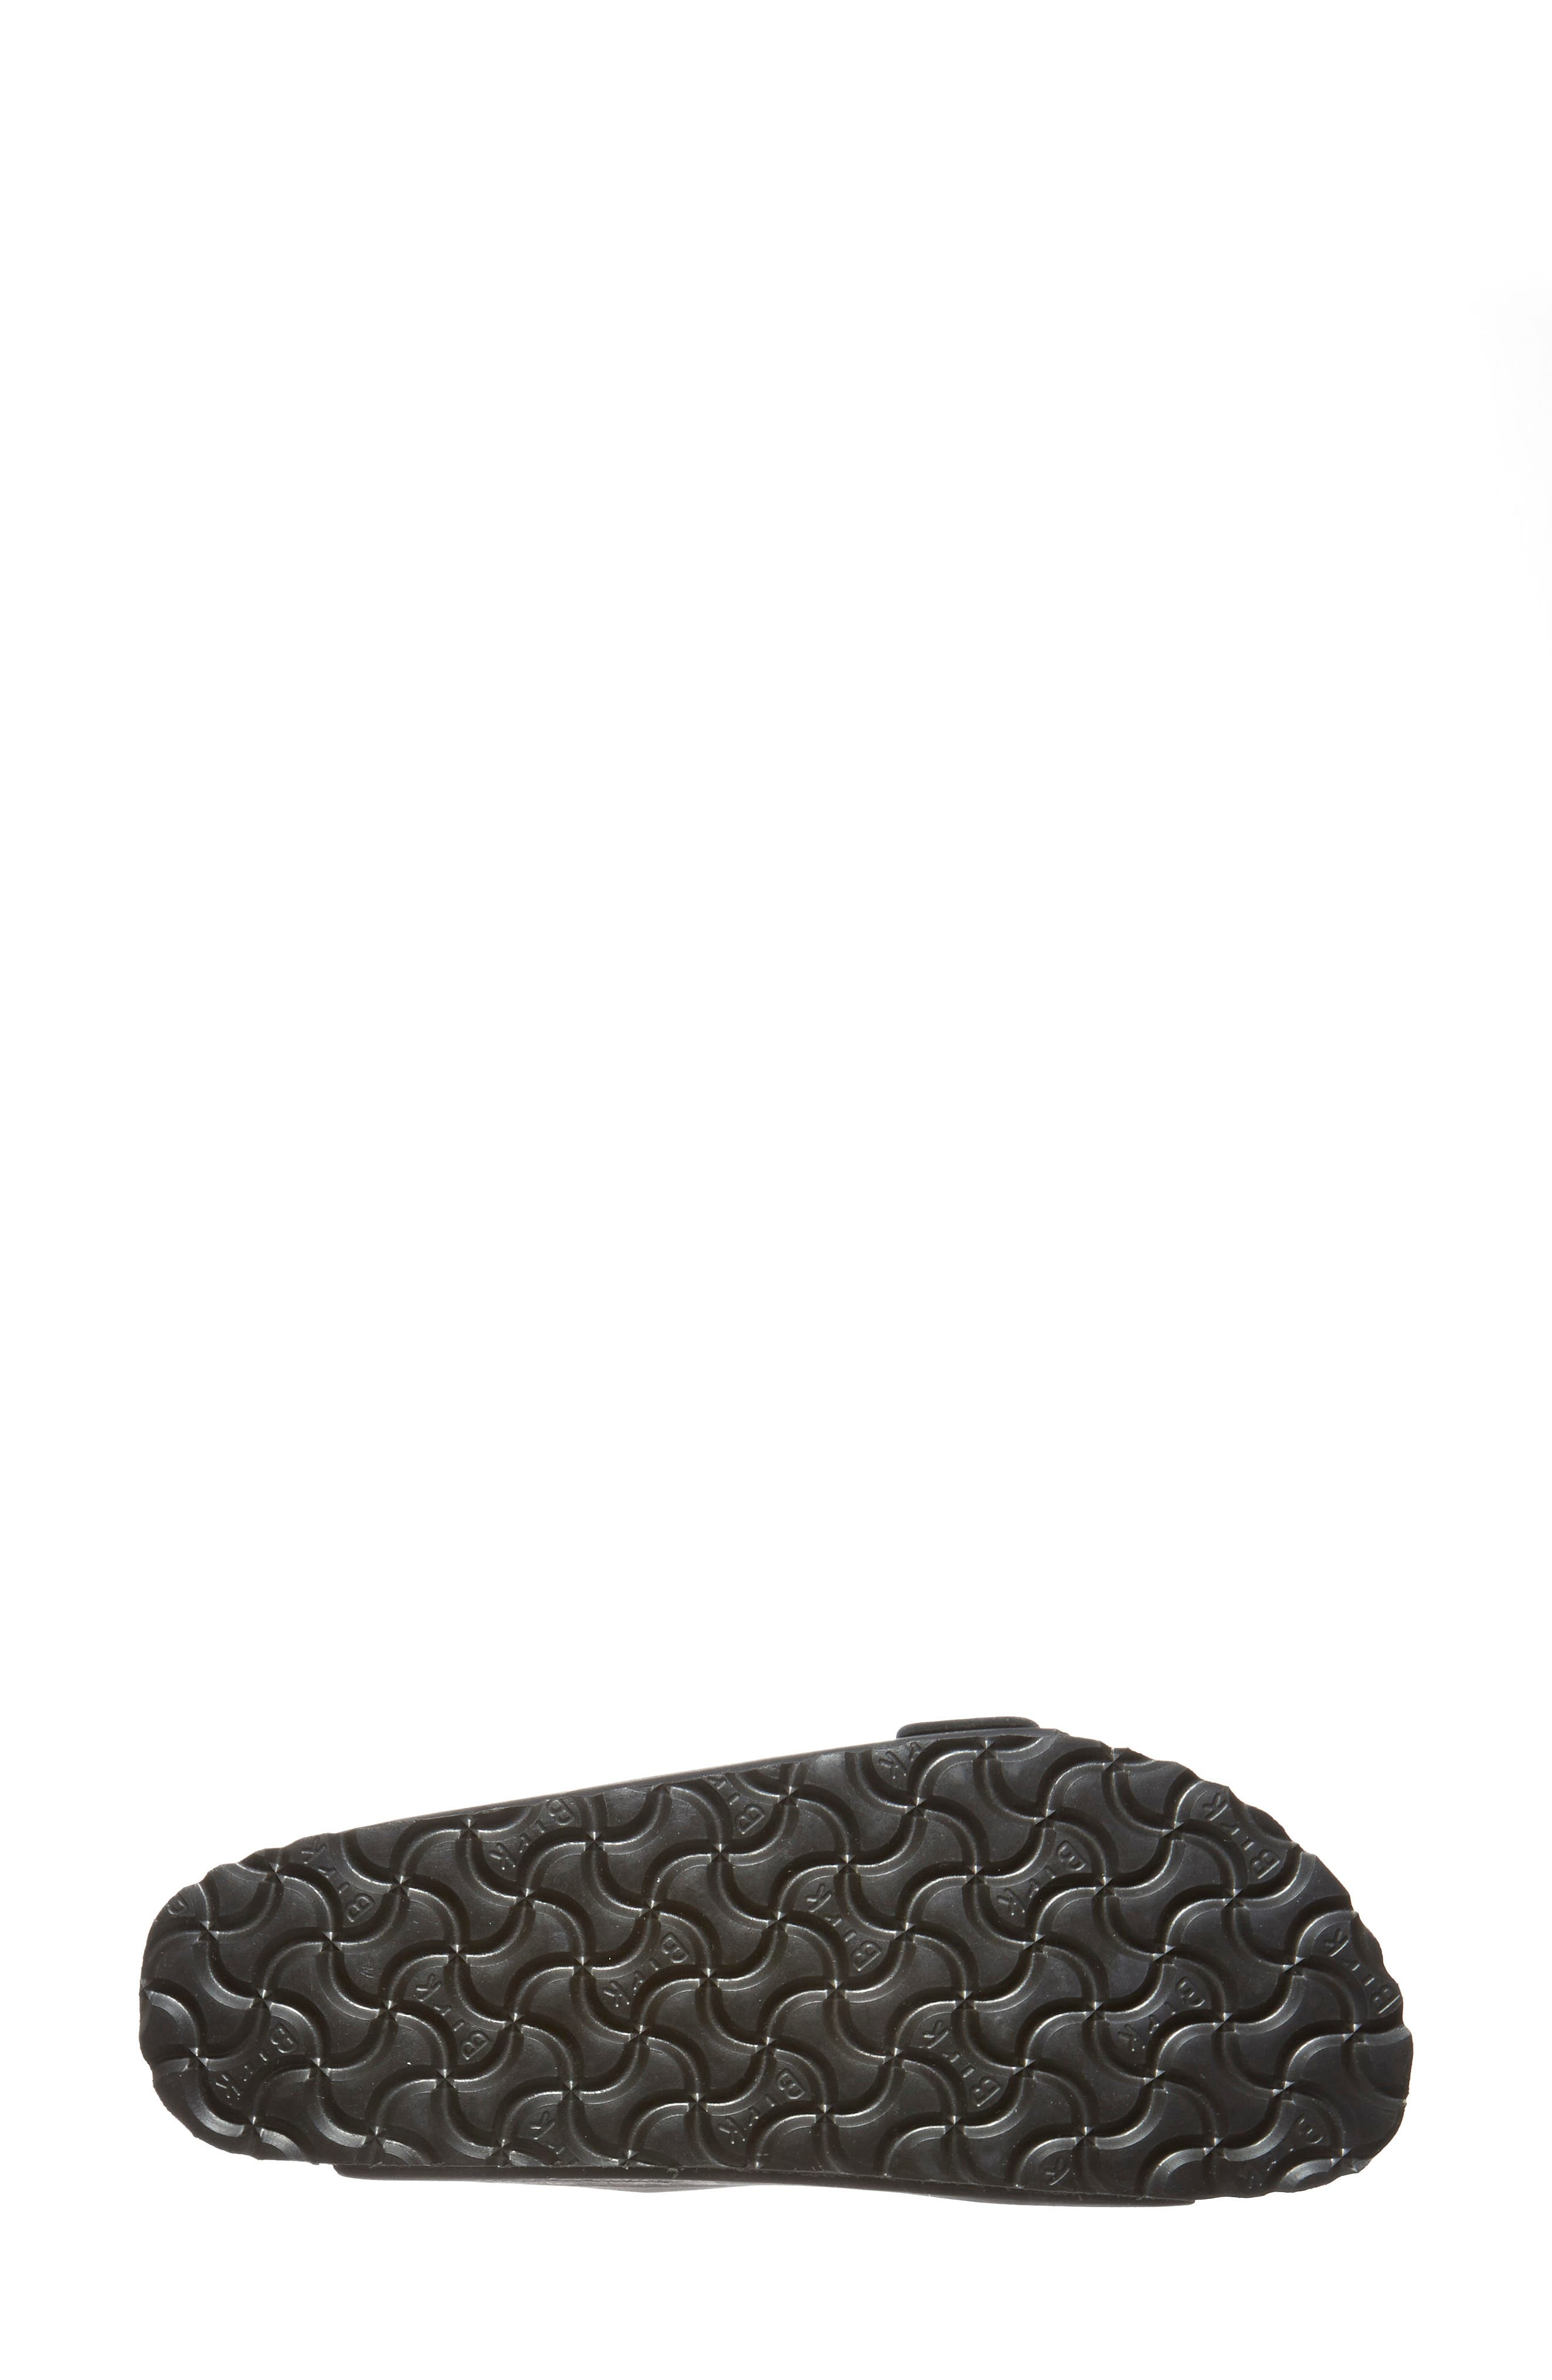 BIRKENSTOCK, Arizona Soft Footbed Sandal, Alternate thumbnail 4, color, BLACK/ BLACK